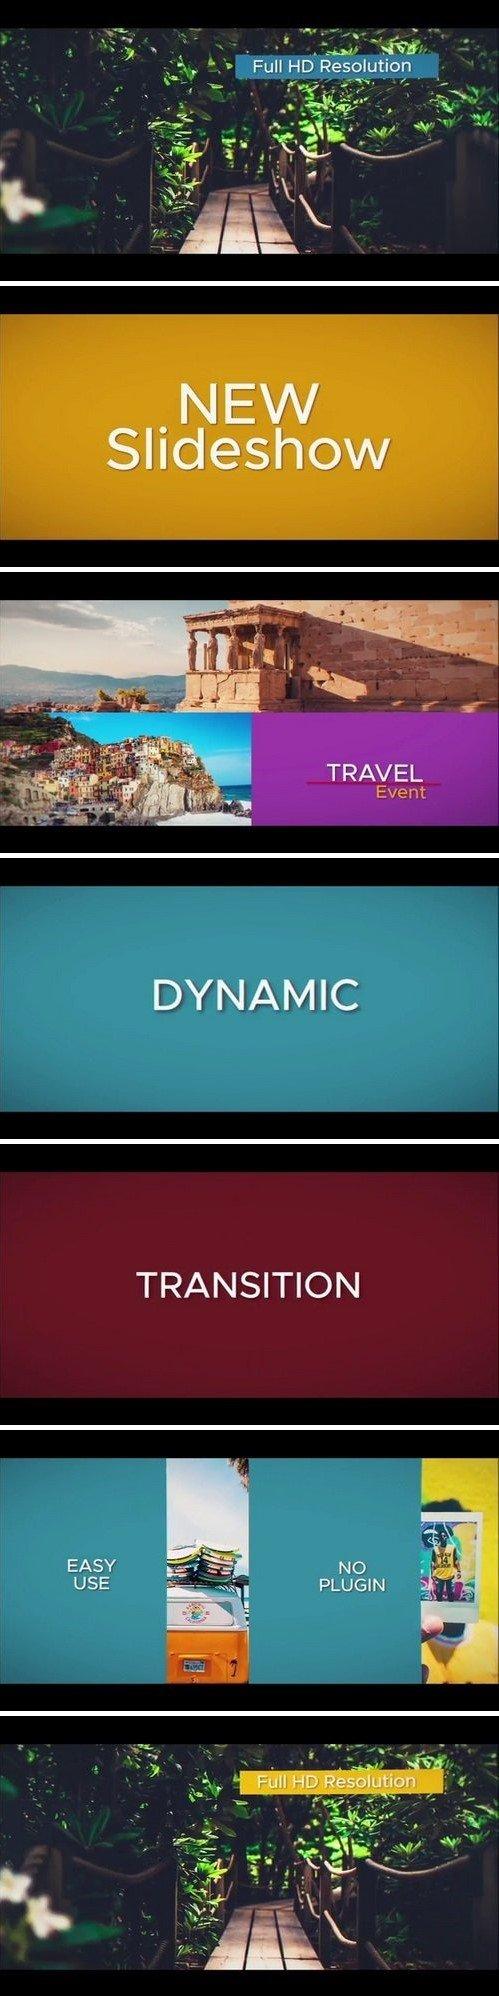 Dynamic Transition Promo 164387